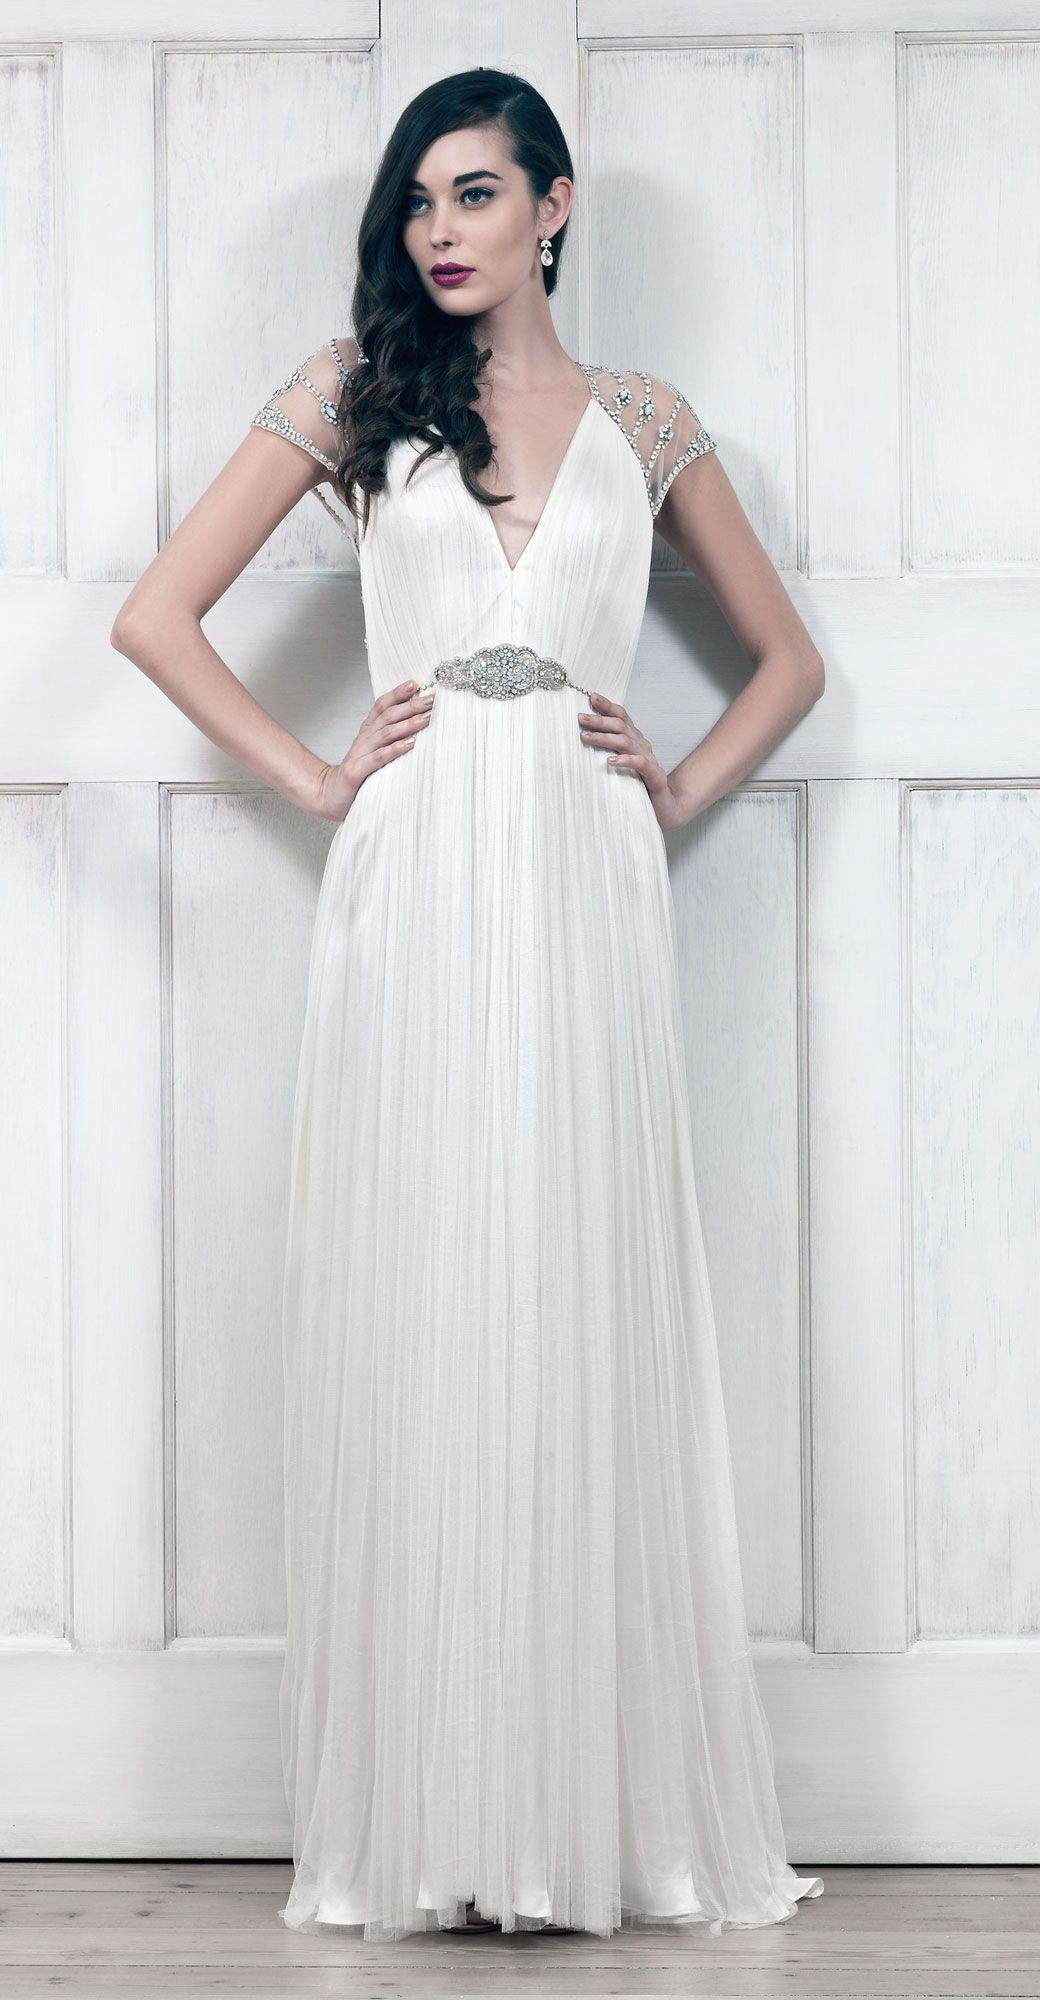 Wedding Dresses from Anne Barge Fall 2015 |Tallulah Wedding Dress